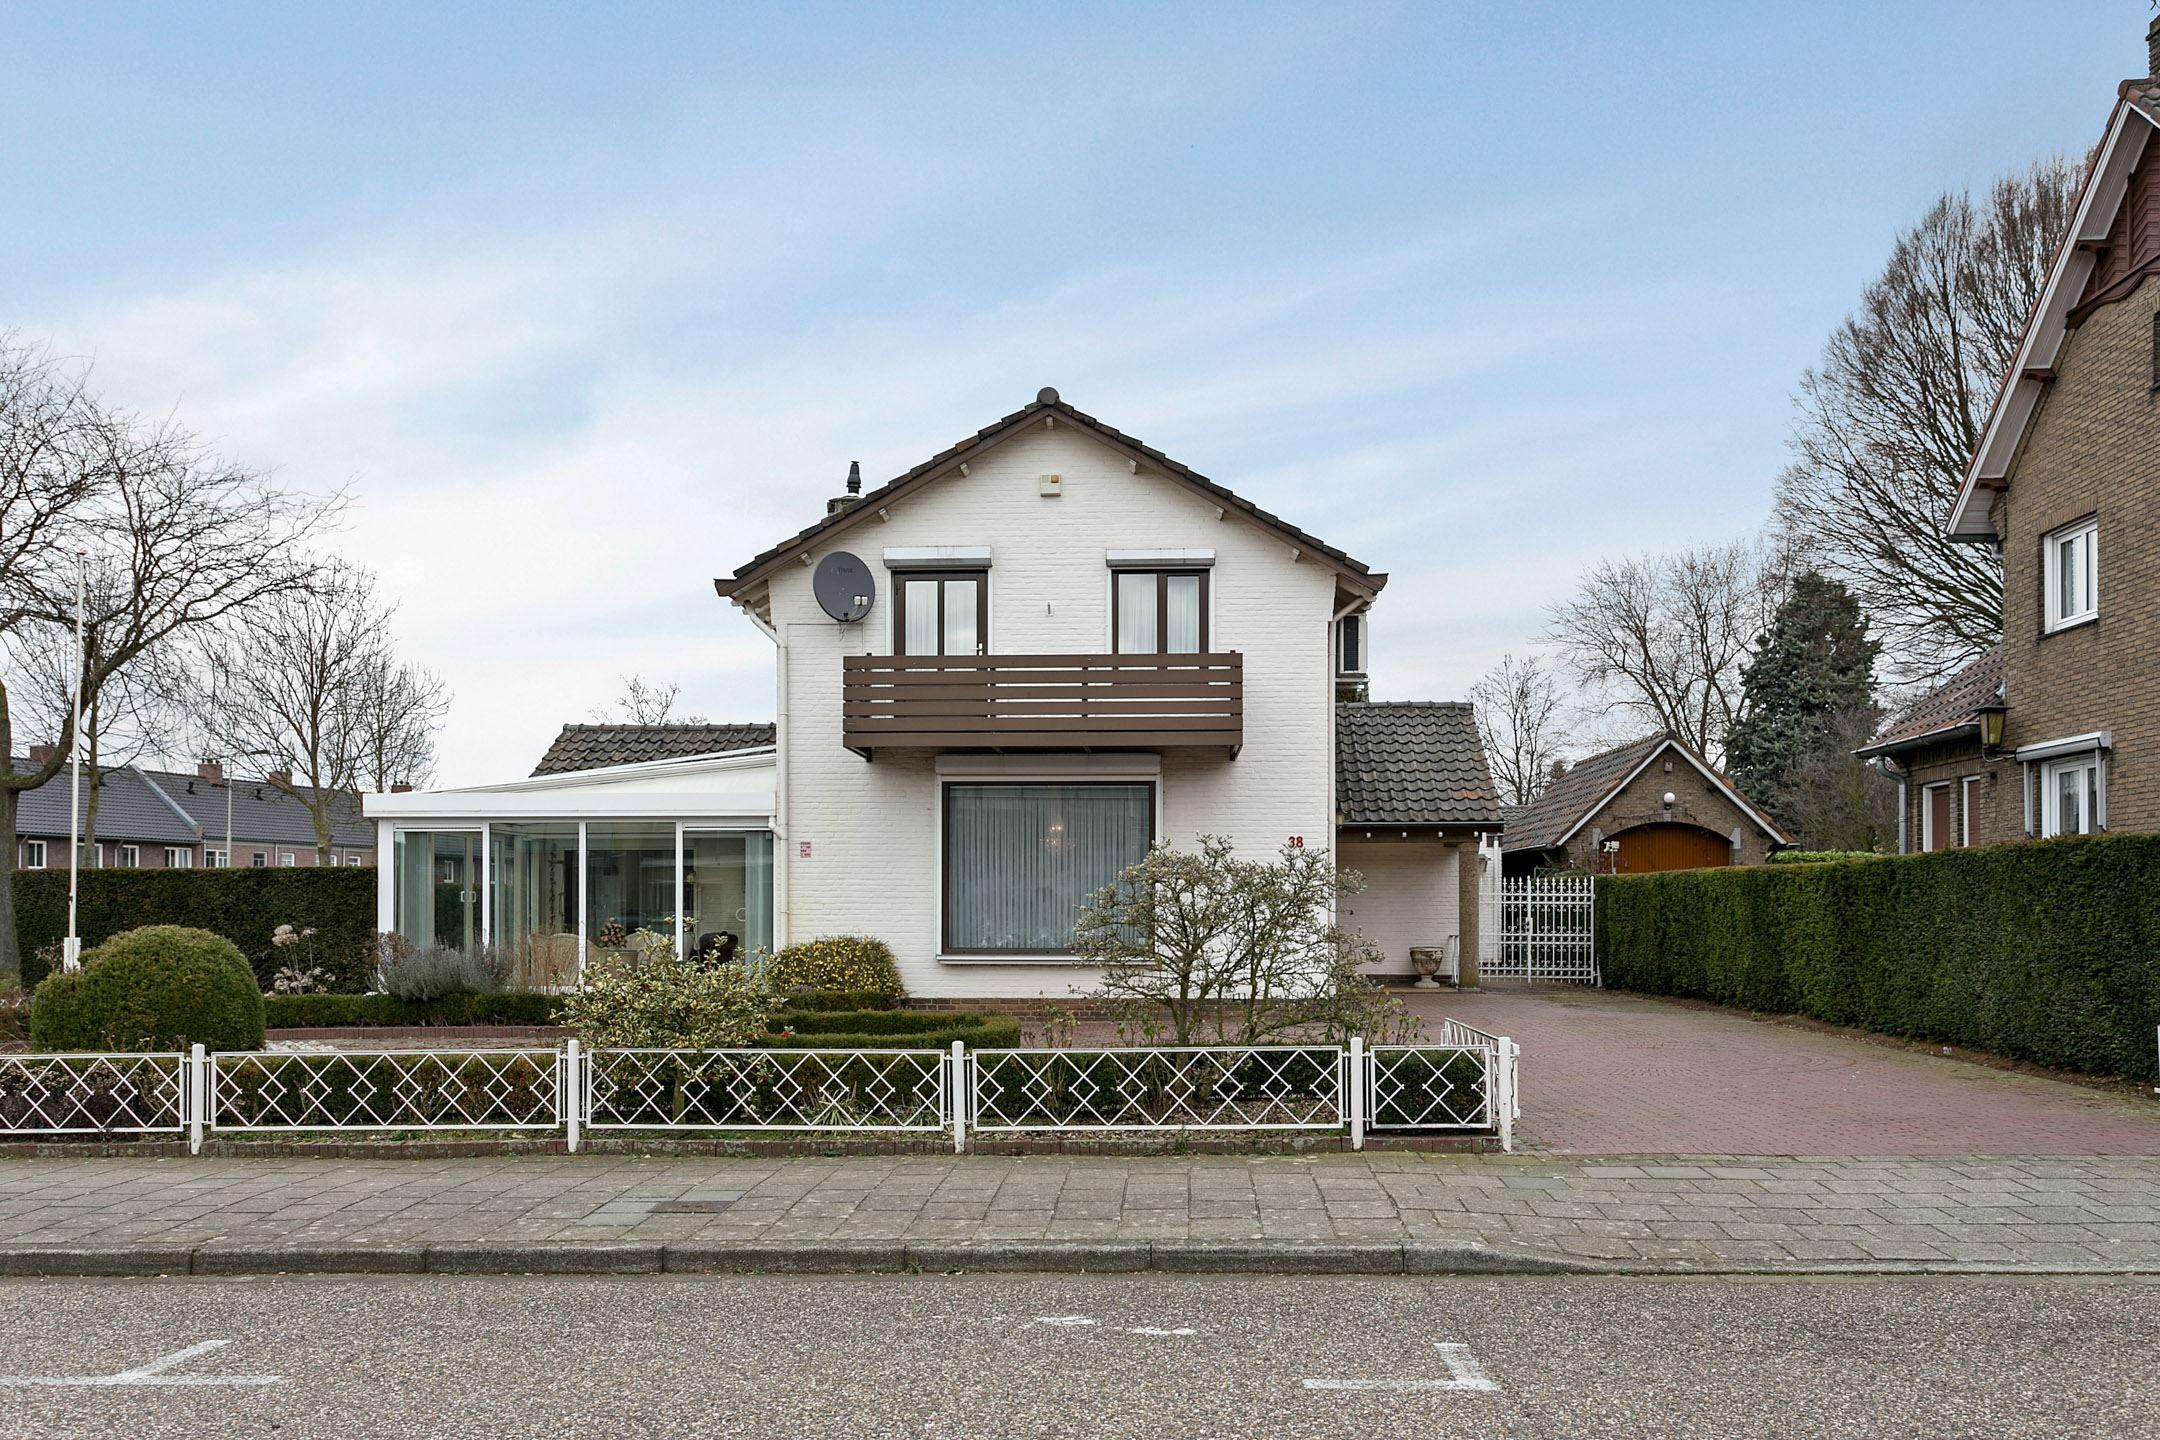 Huis te koop roerzicht 38 6041 xz roermond funda for Huis tuin roermond